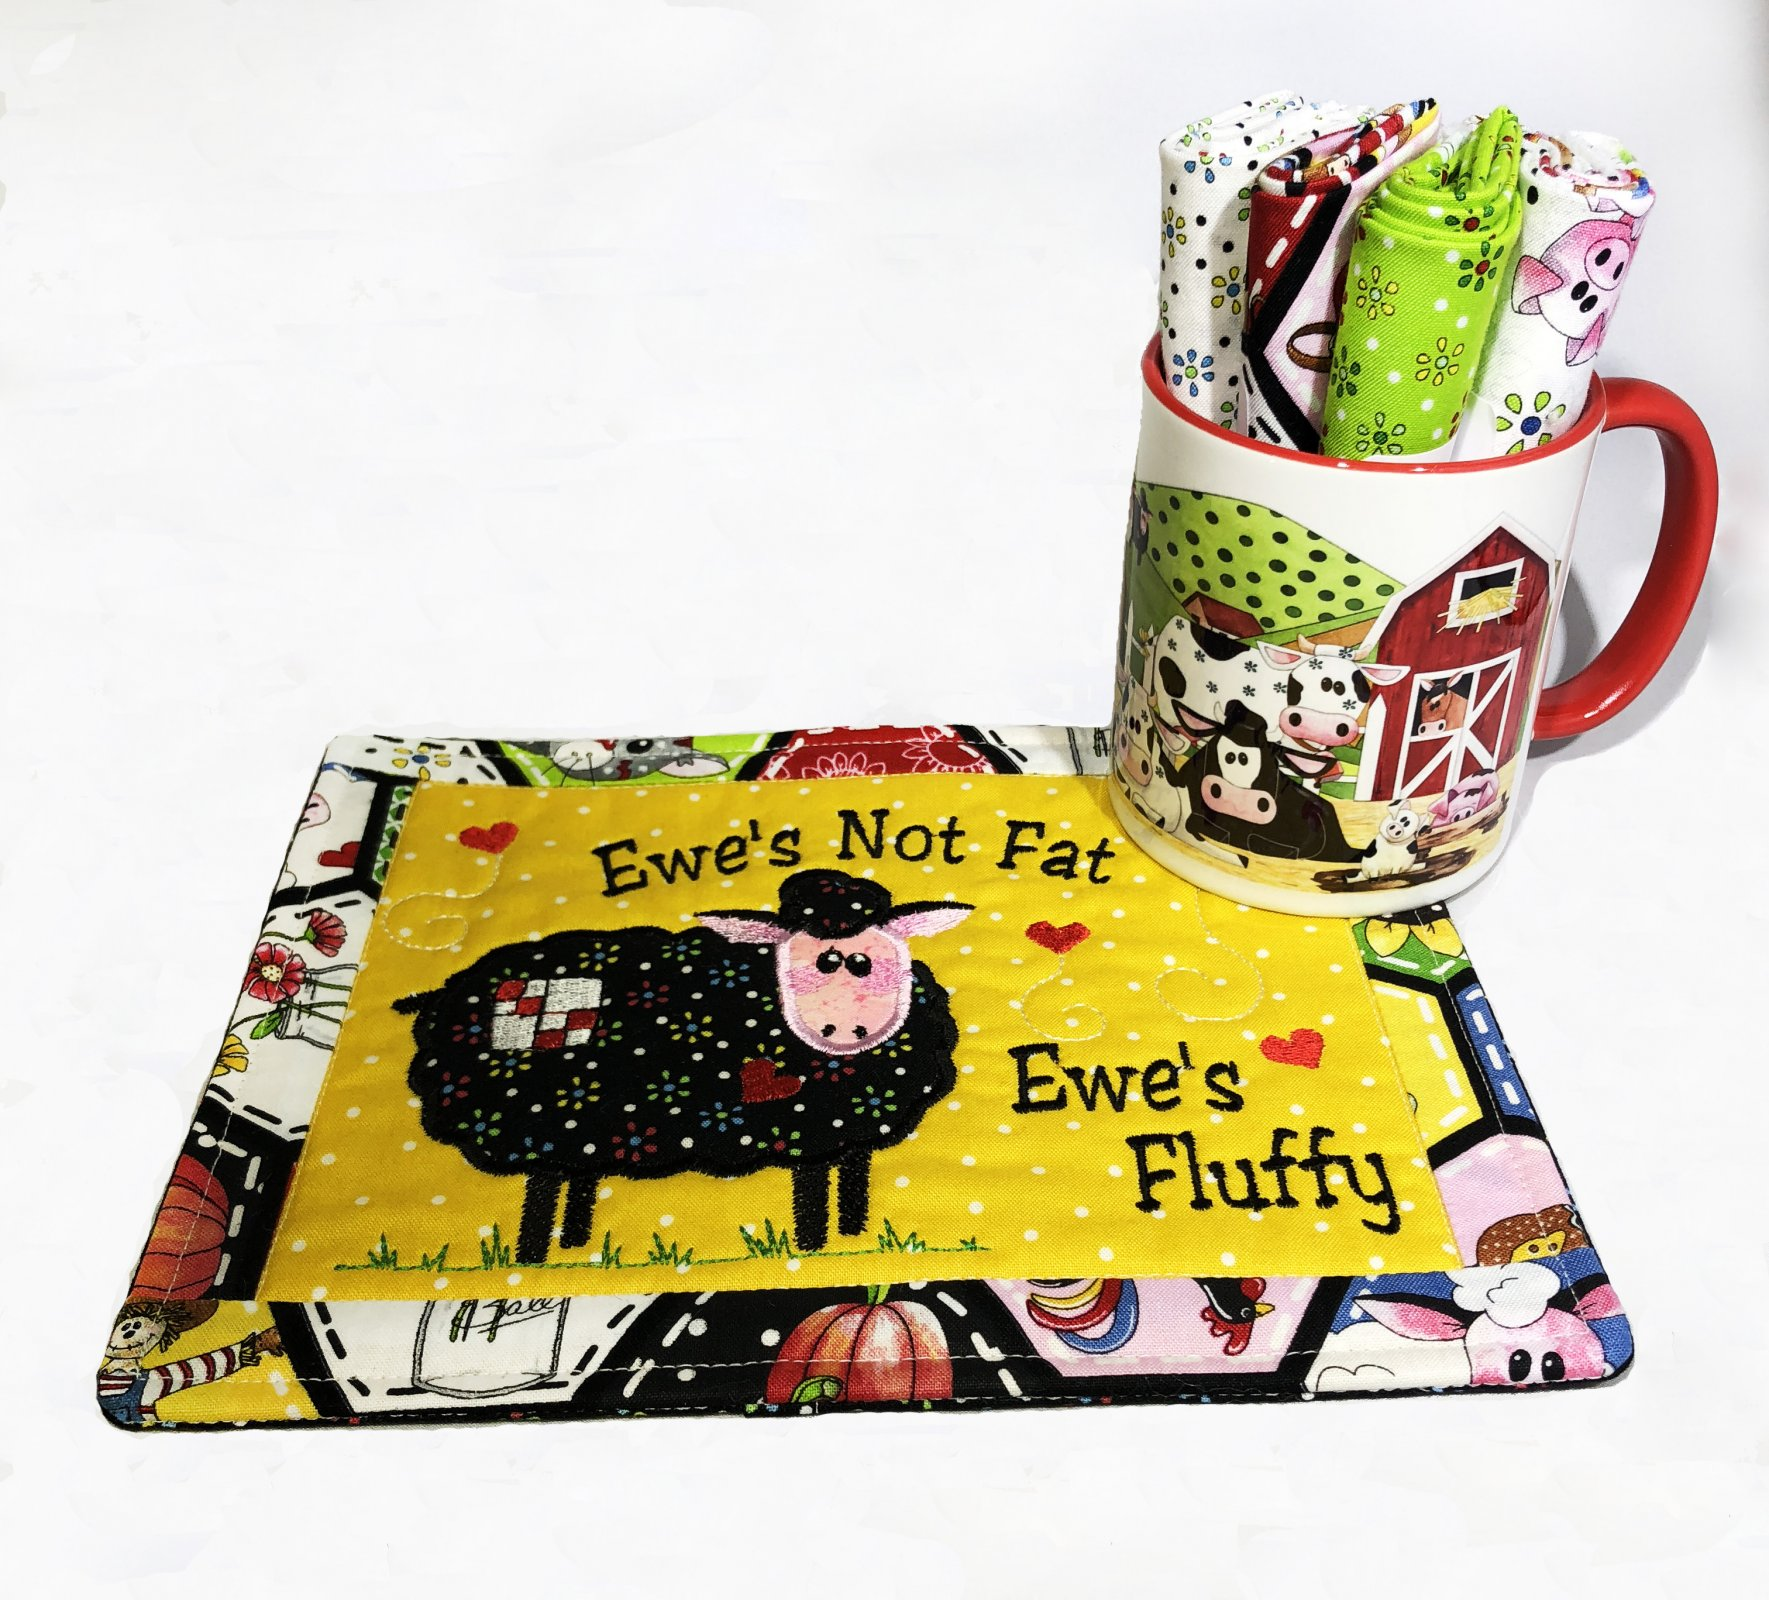 Limited Edition Ewe's Not Fat Ewe's Fluffy Mug Rug Embroidery CD with matching Coffee Mug Kit